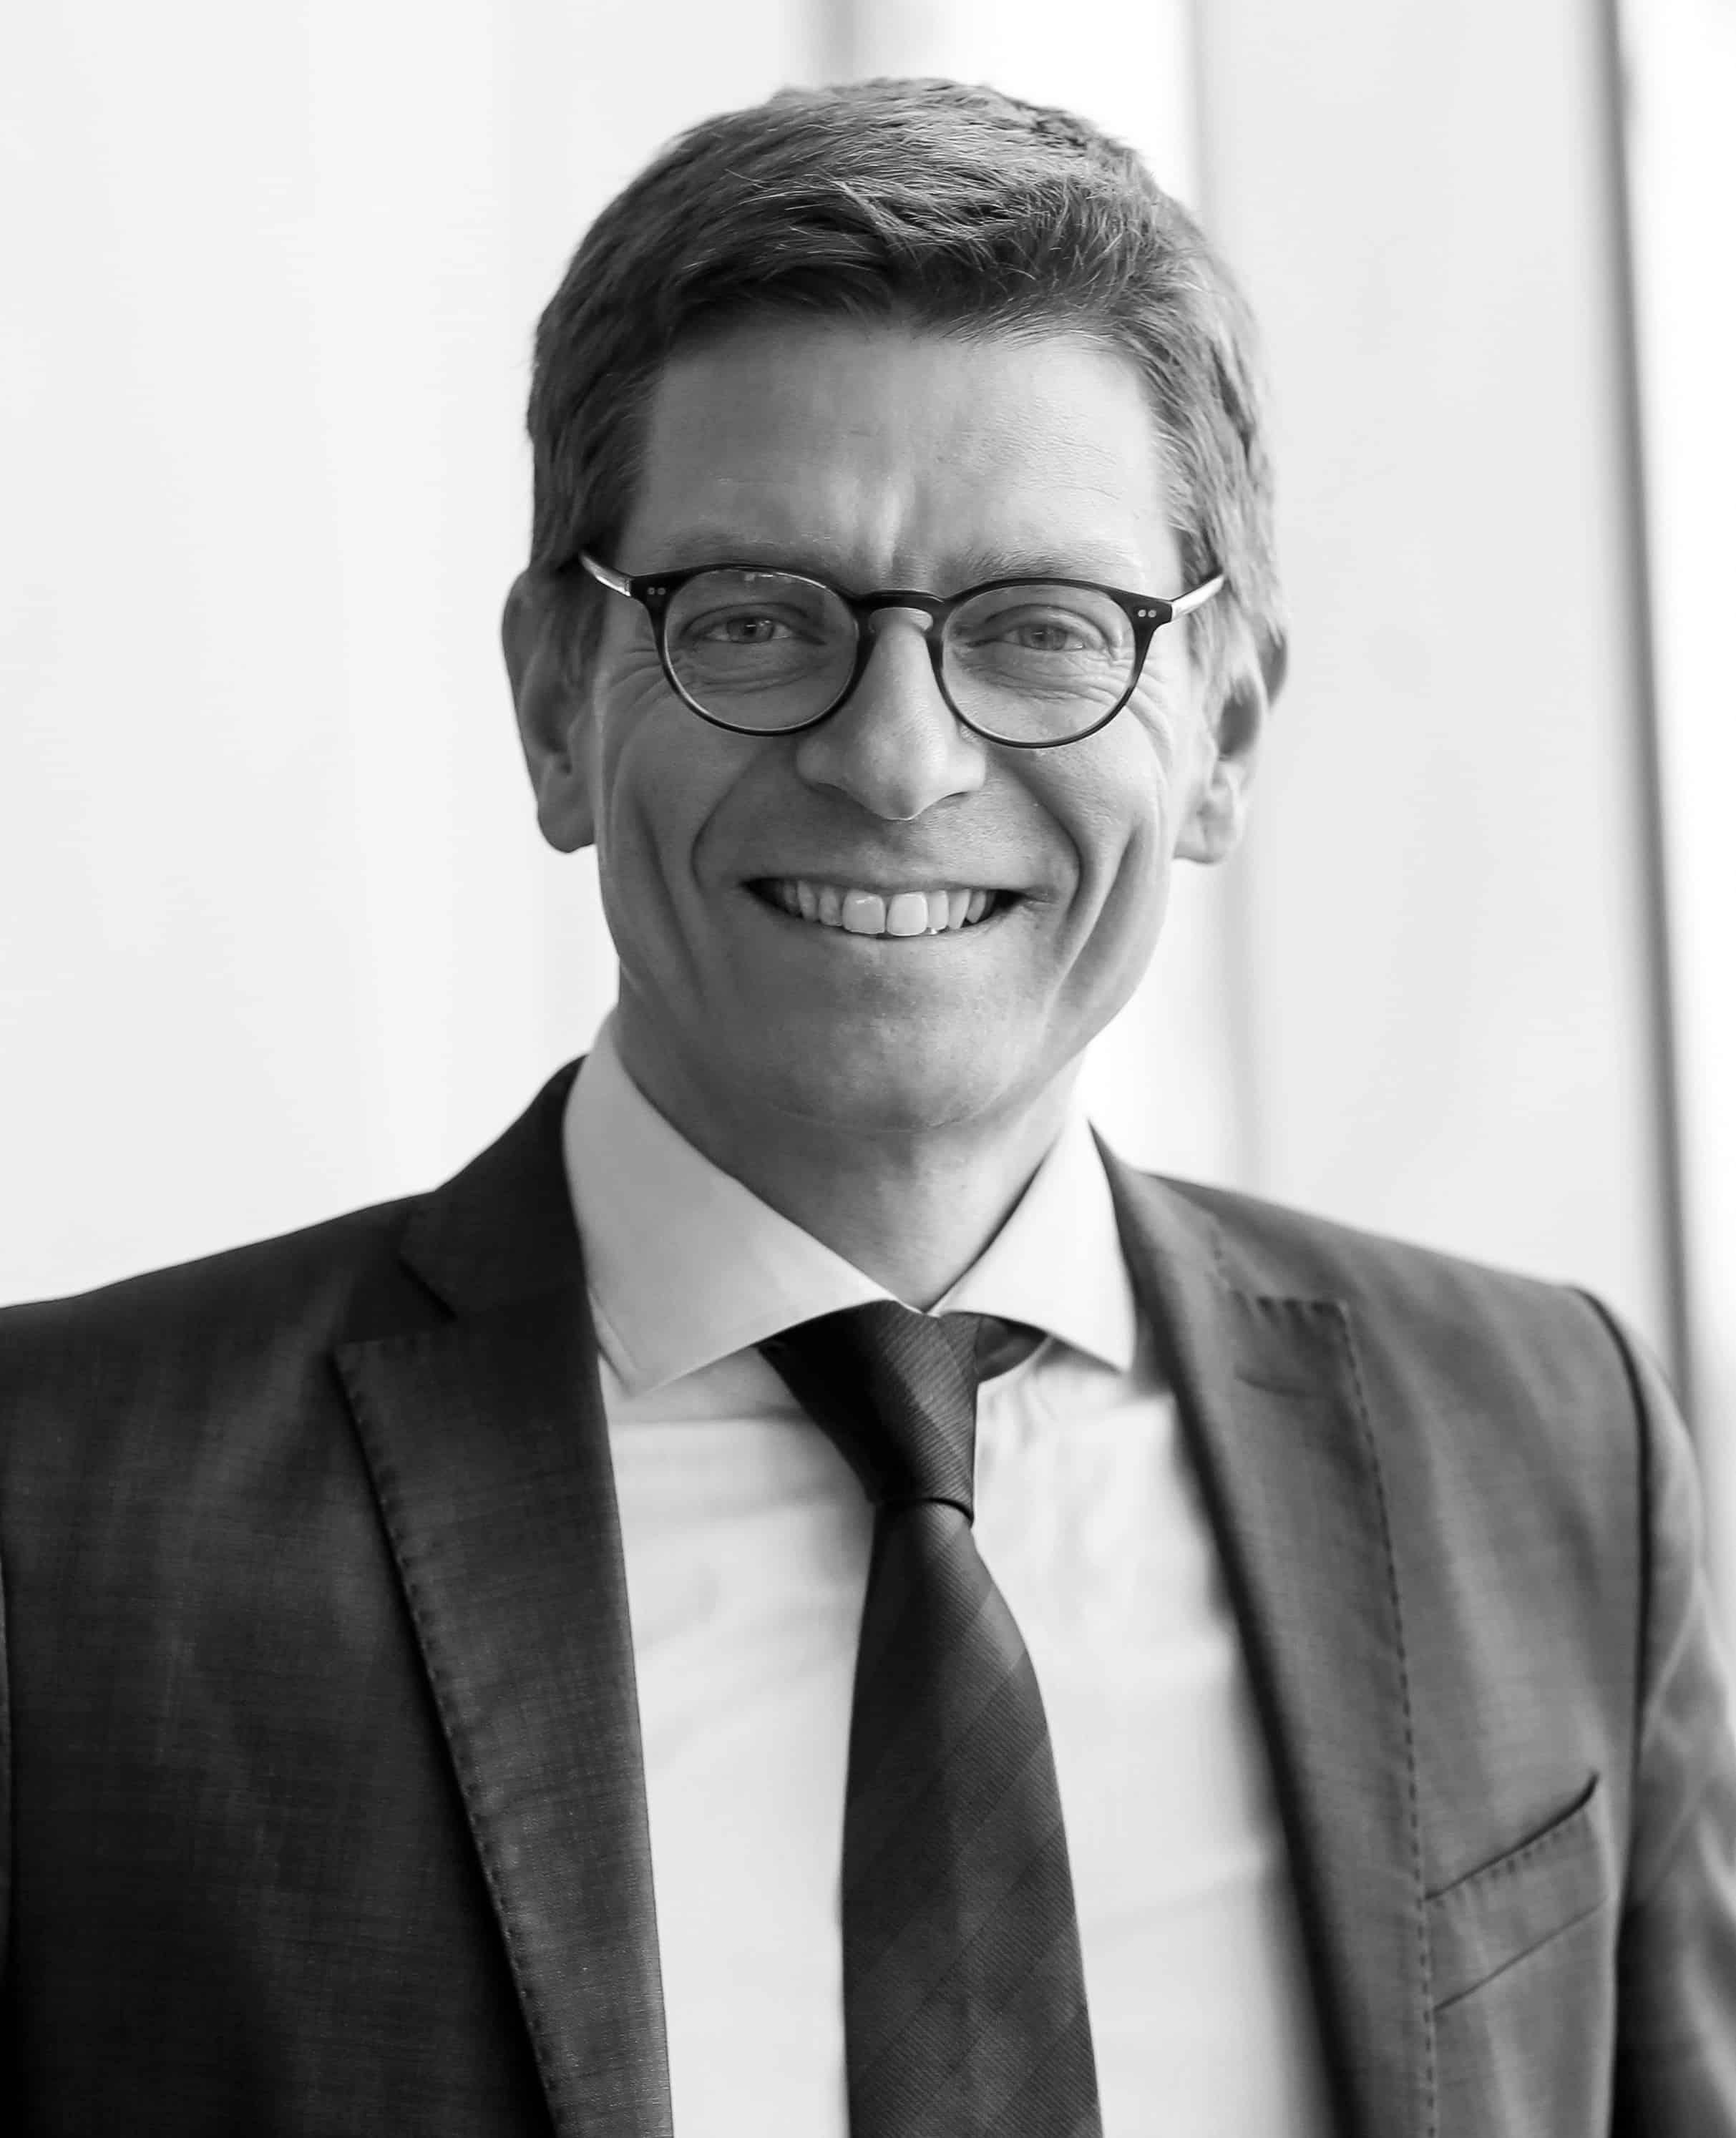 LARS FRELLE PETERSEN   Director of Digitisation, The Confederation of Danish Industry (DI)